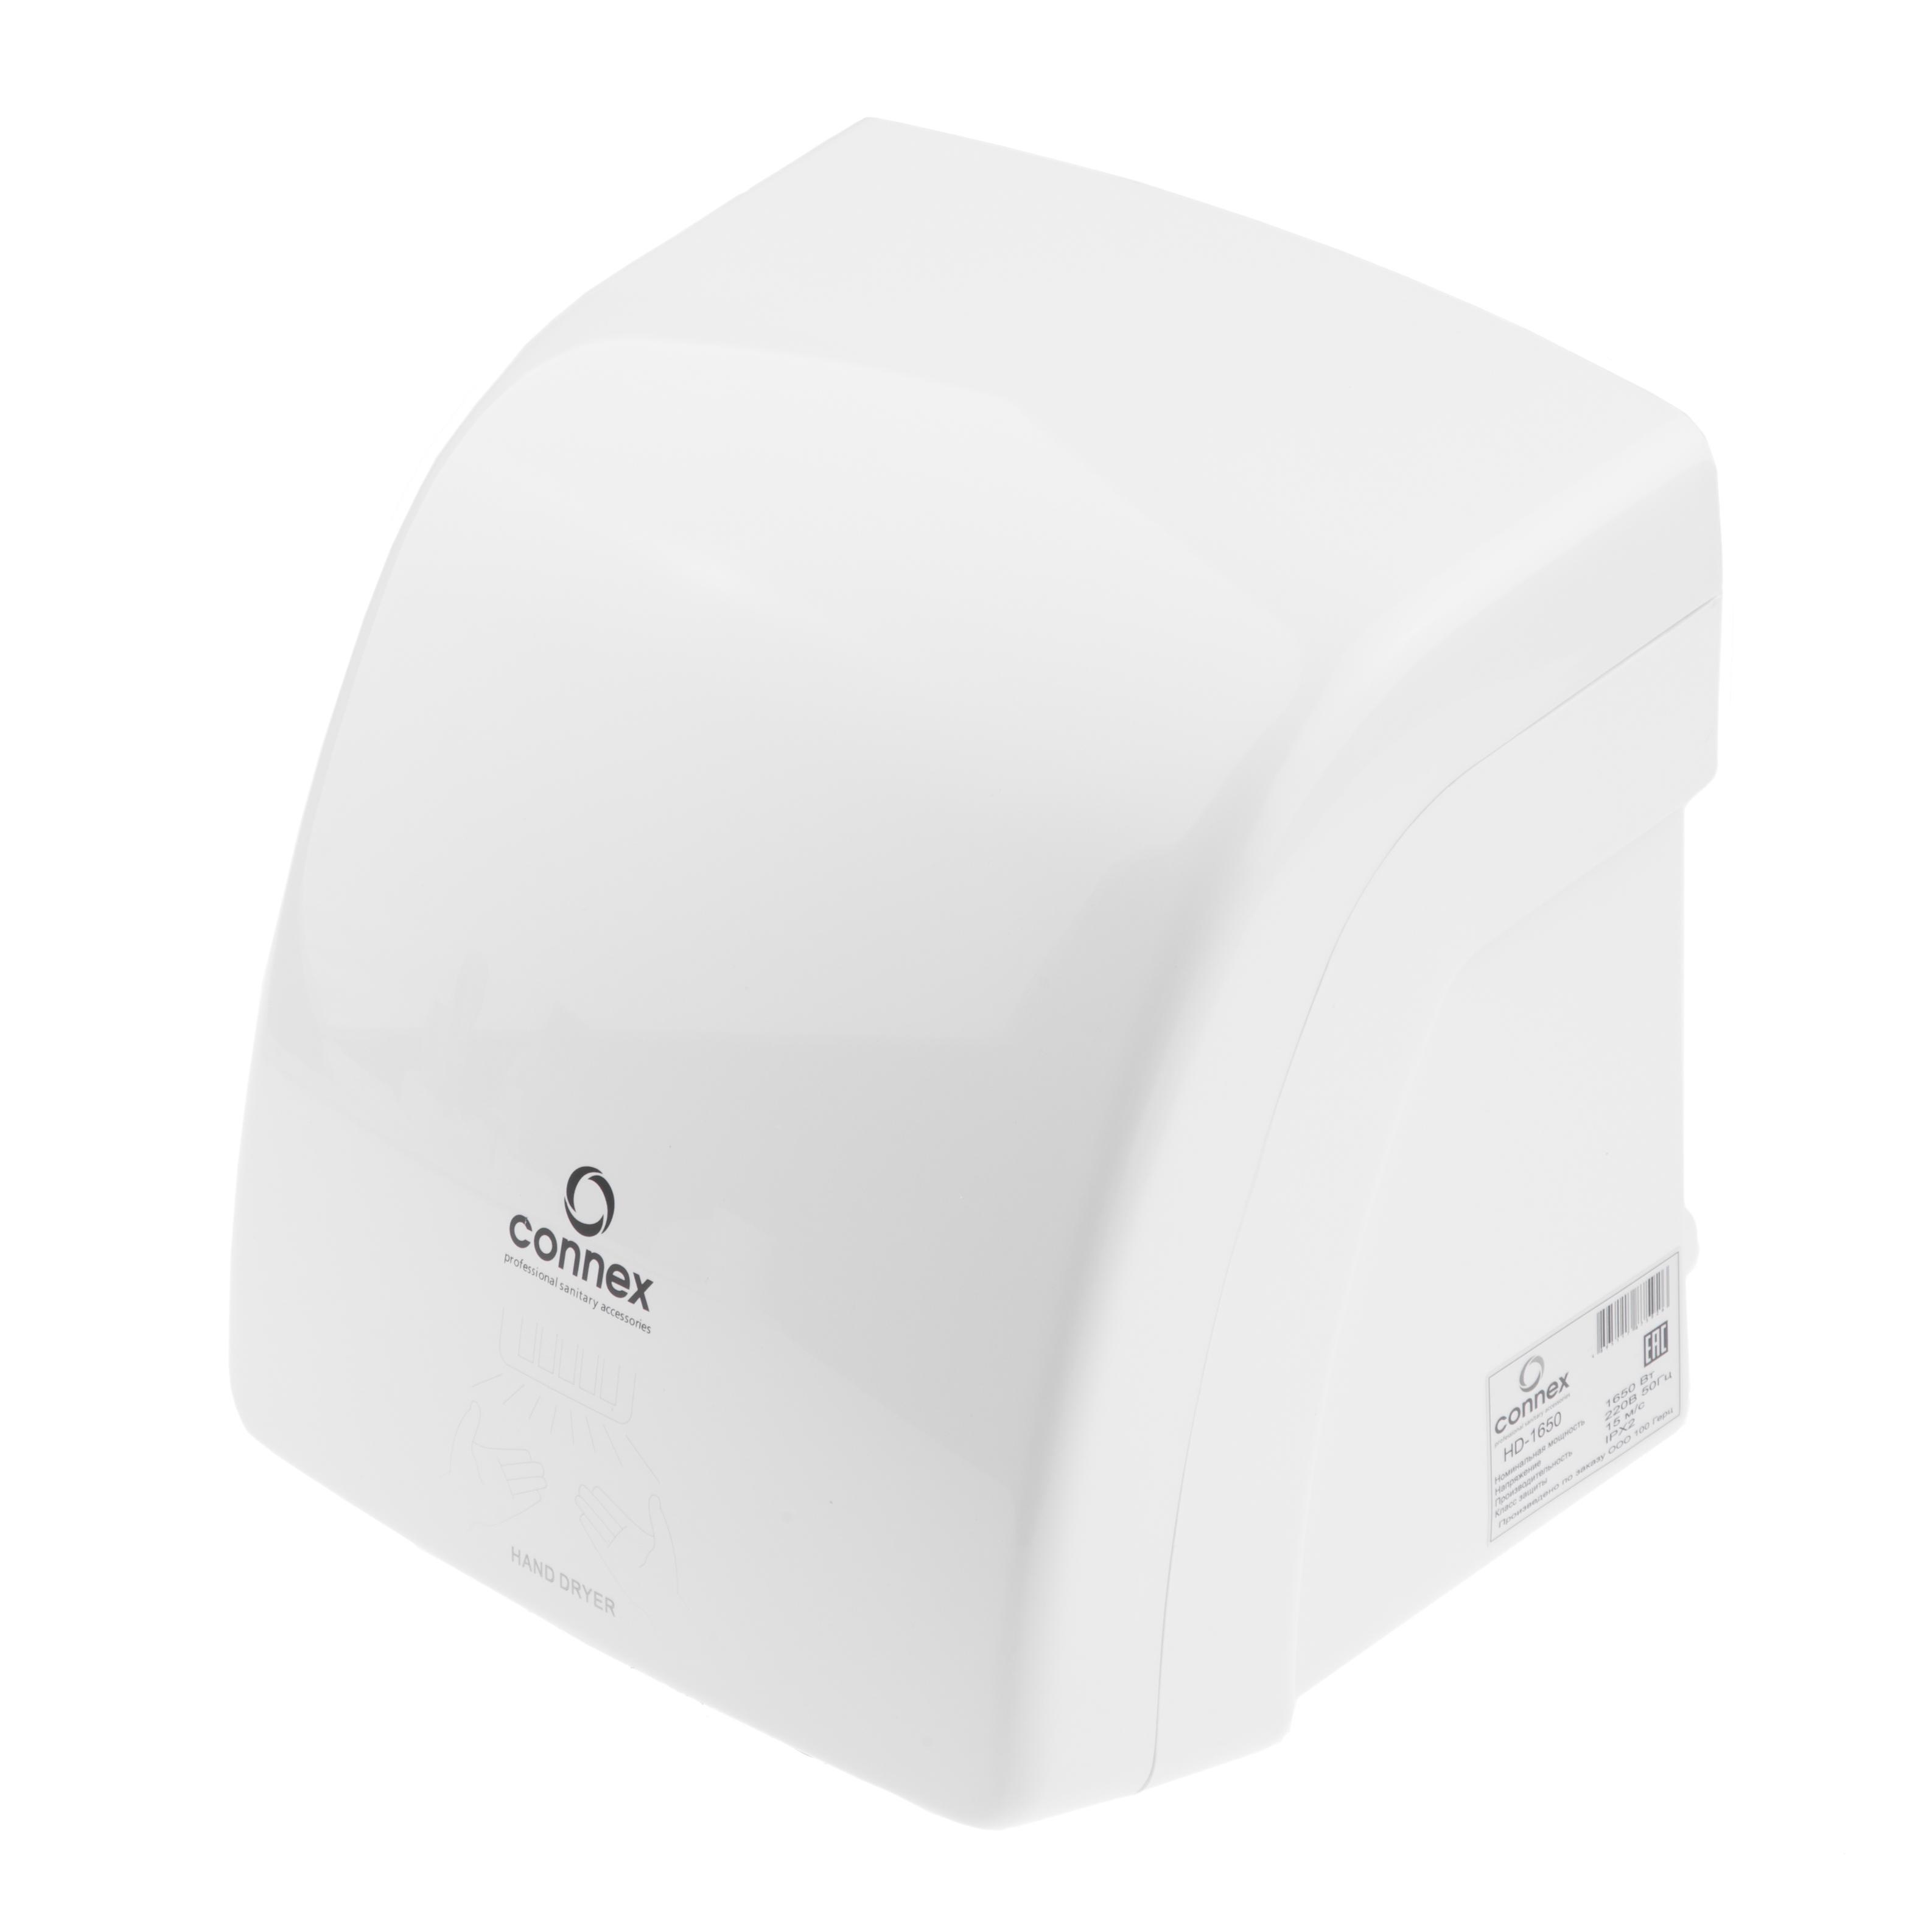 Сушилка для рук Connex Hd-1650 сушилка для рук connex hd 850